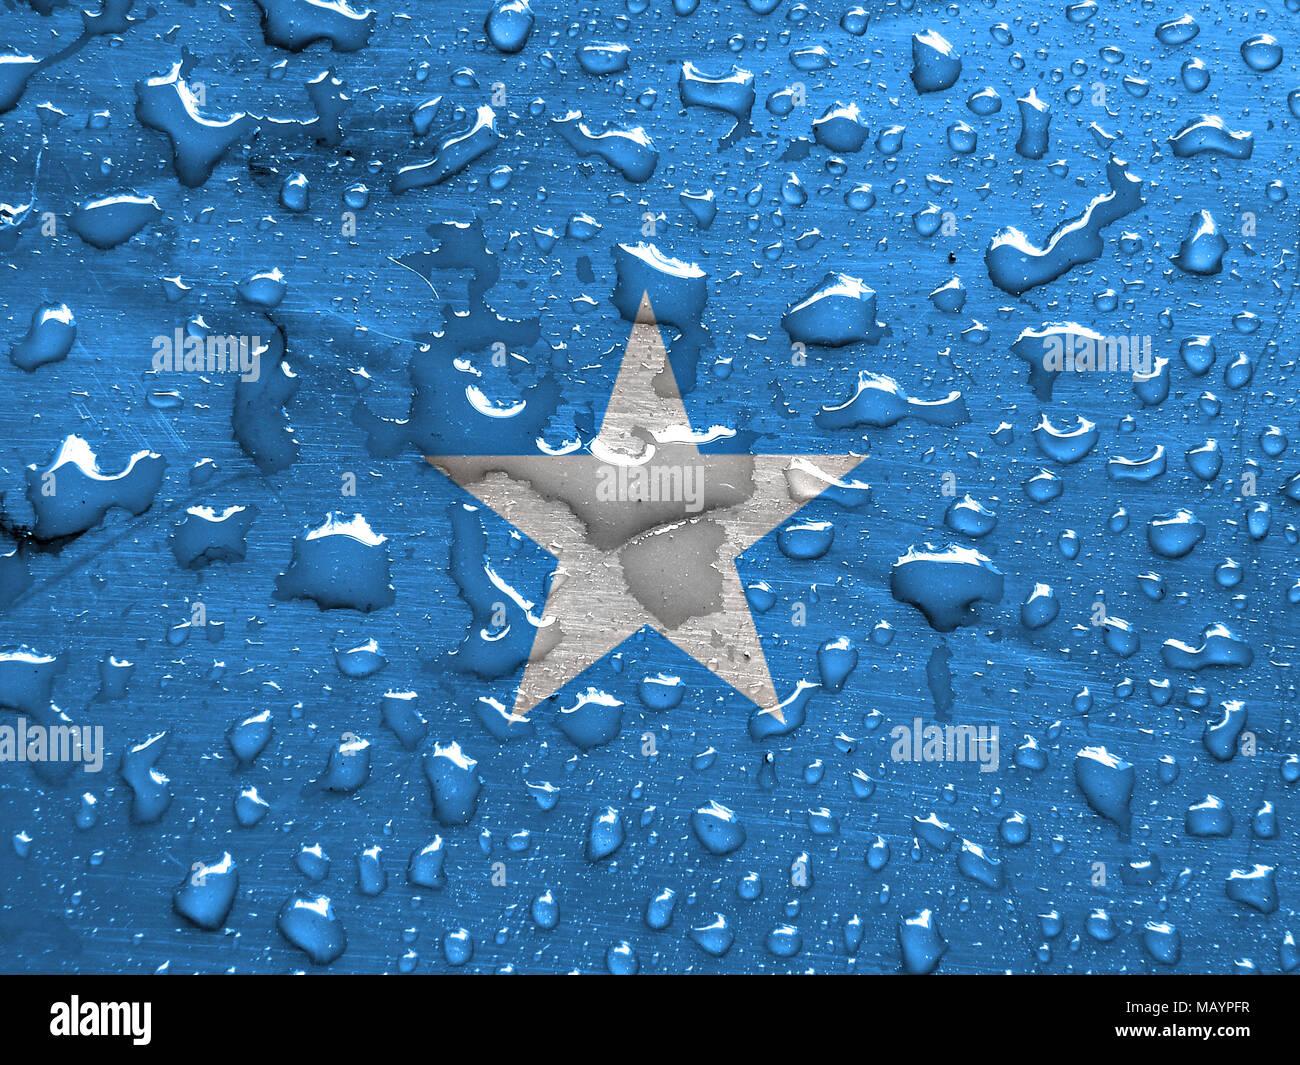 flag of Somalia with rain drops - Stock Image